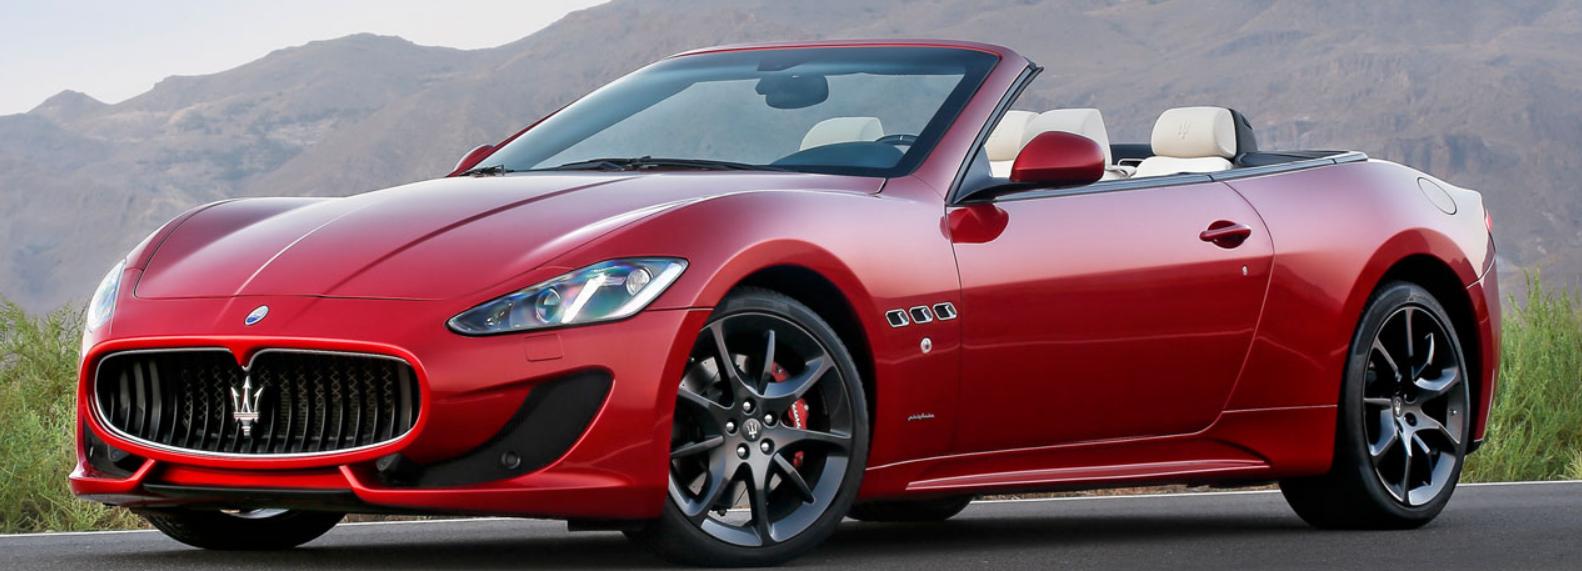 Maserati_Gran_Cabrio_Sport-ด้านข้าง